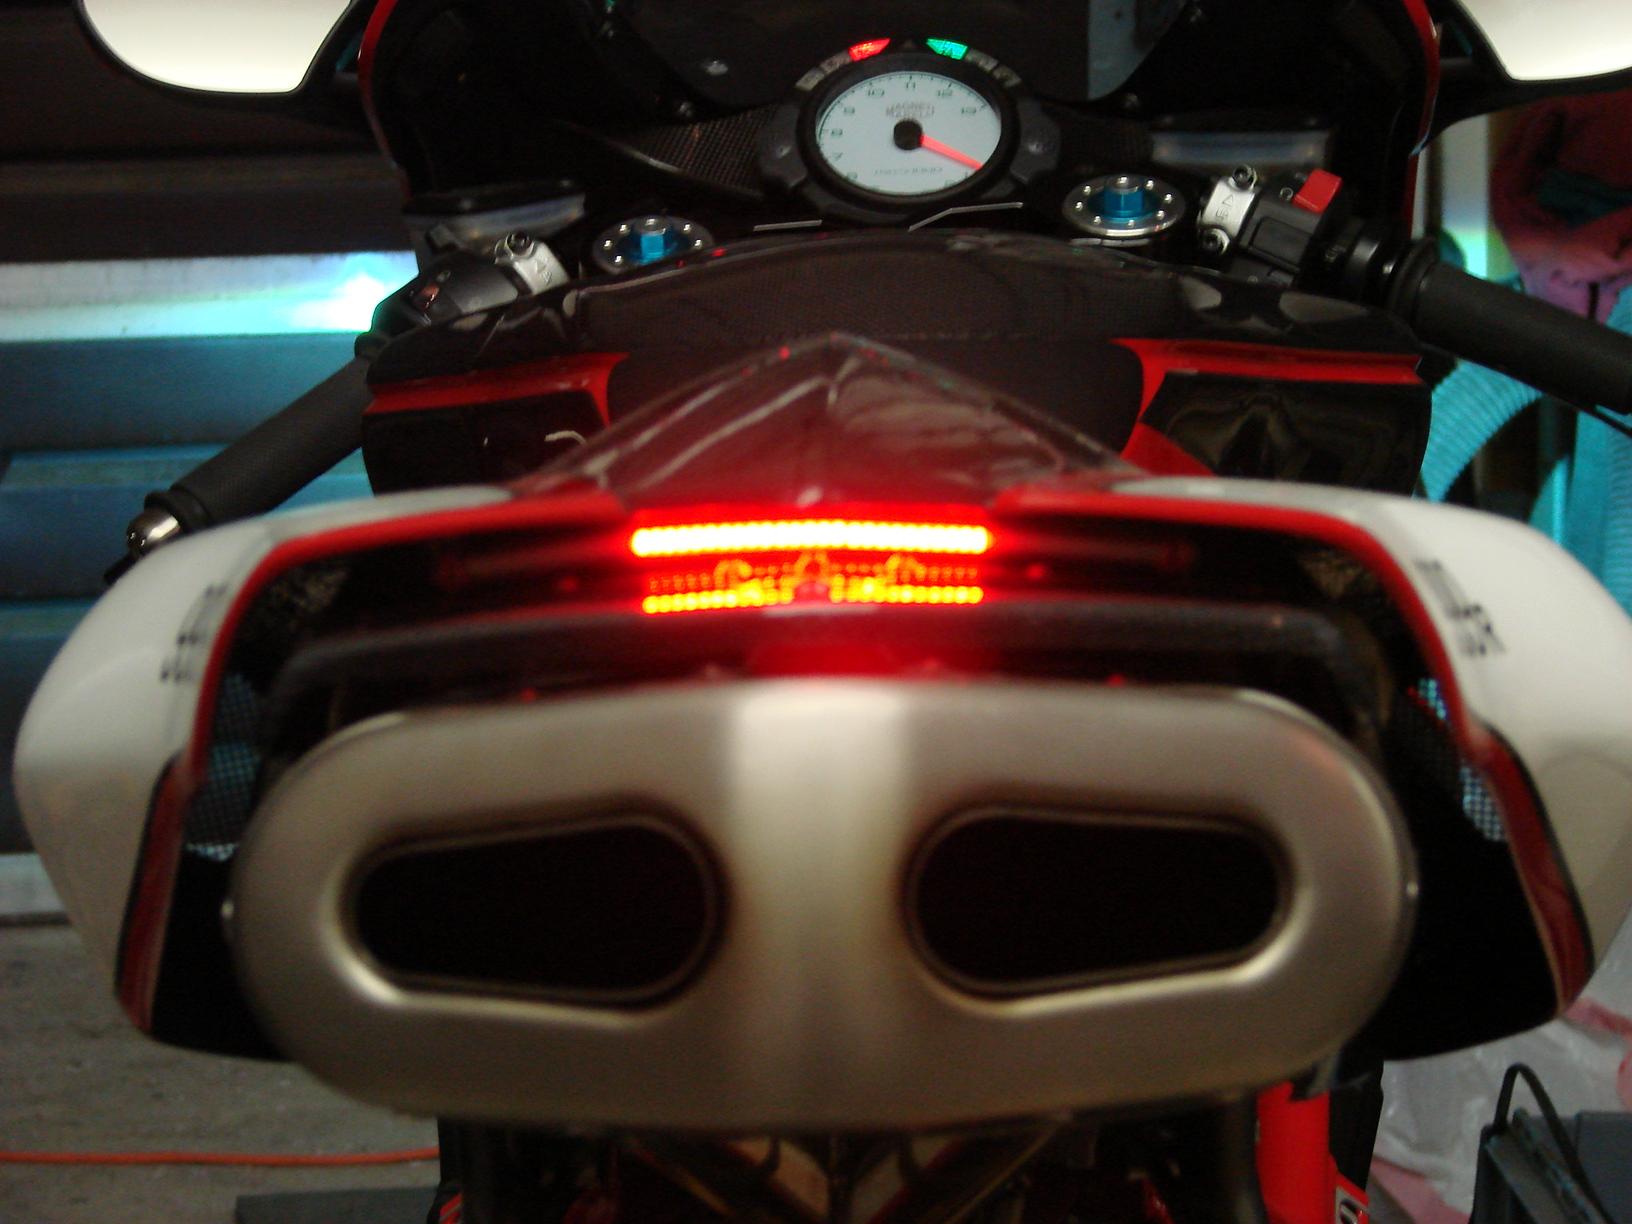 Ducati Tail Light Wiring Custom Diagram S4rs 749 999 Leo Vince Exhaust Brake Option Rh Ms